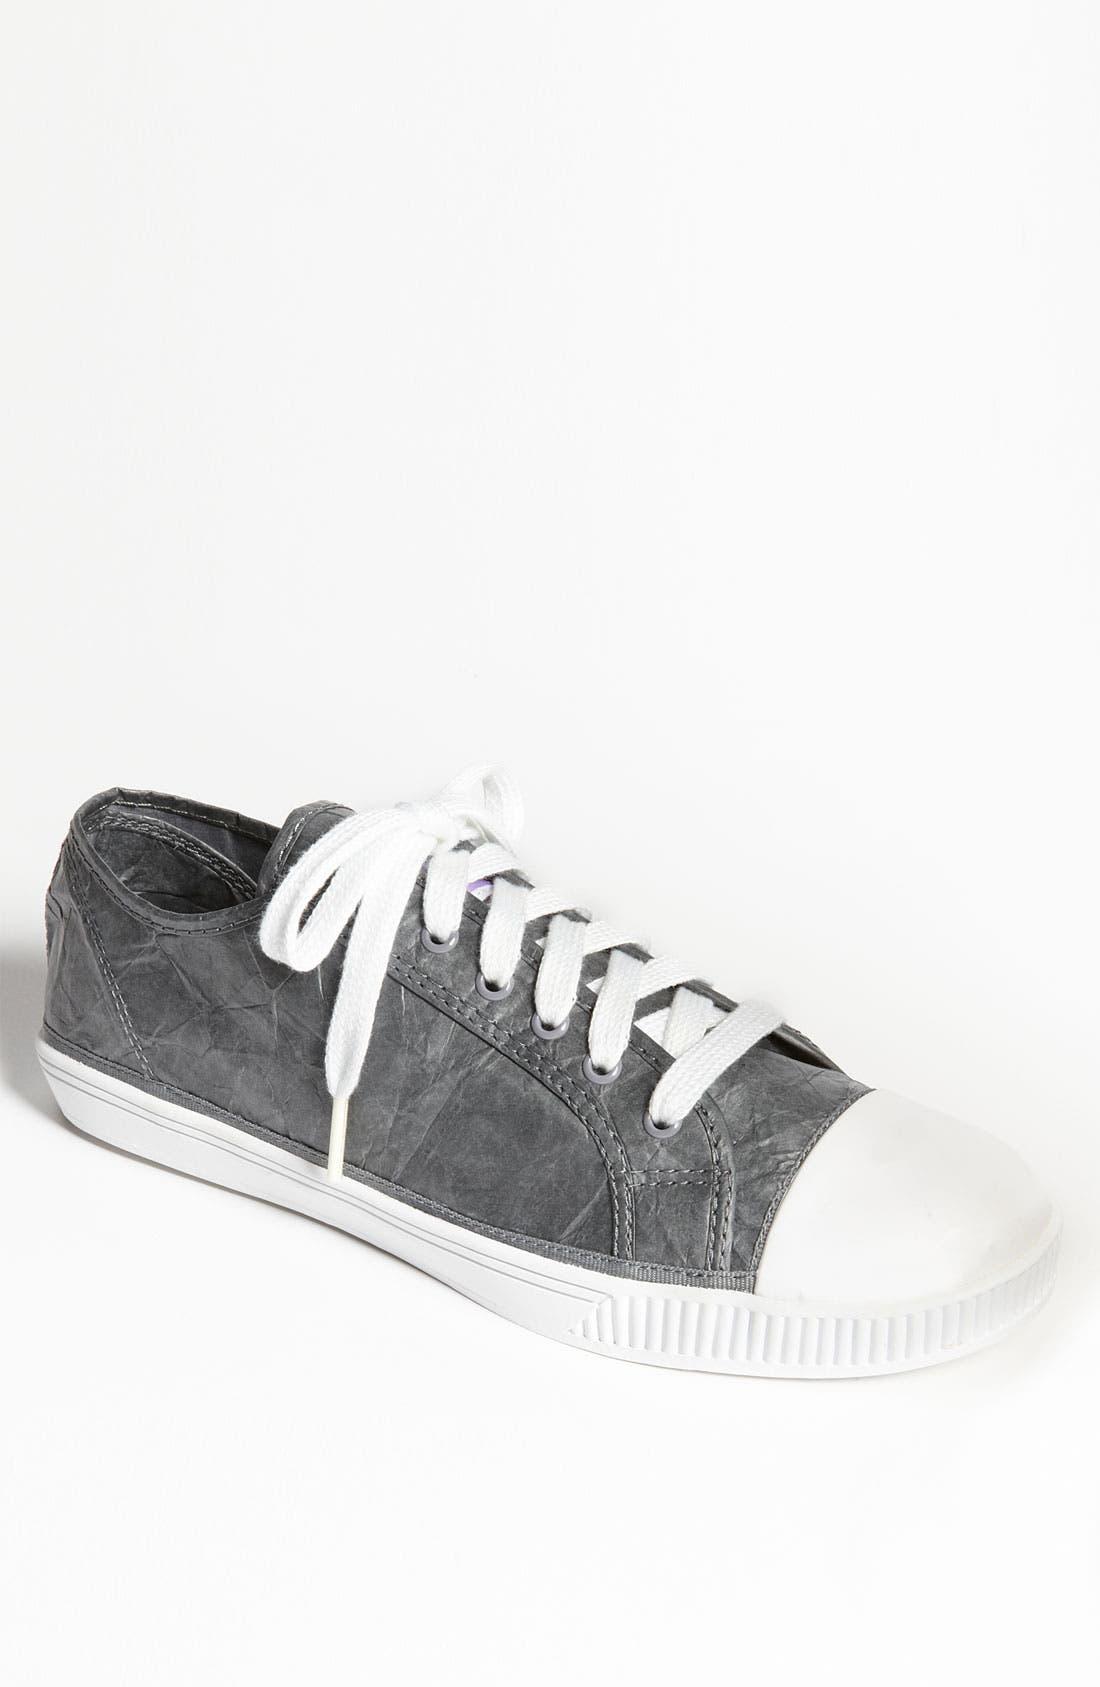 Alternate Image 1 Selected - Civic Duty 'Fascination' Sneaker (Men)